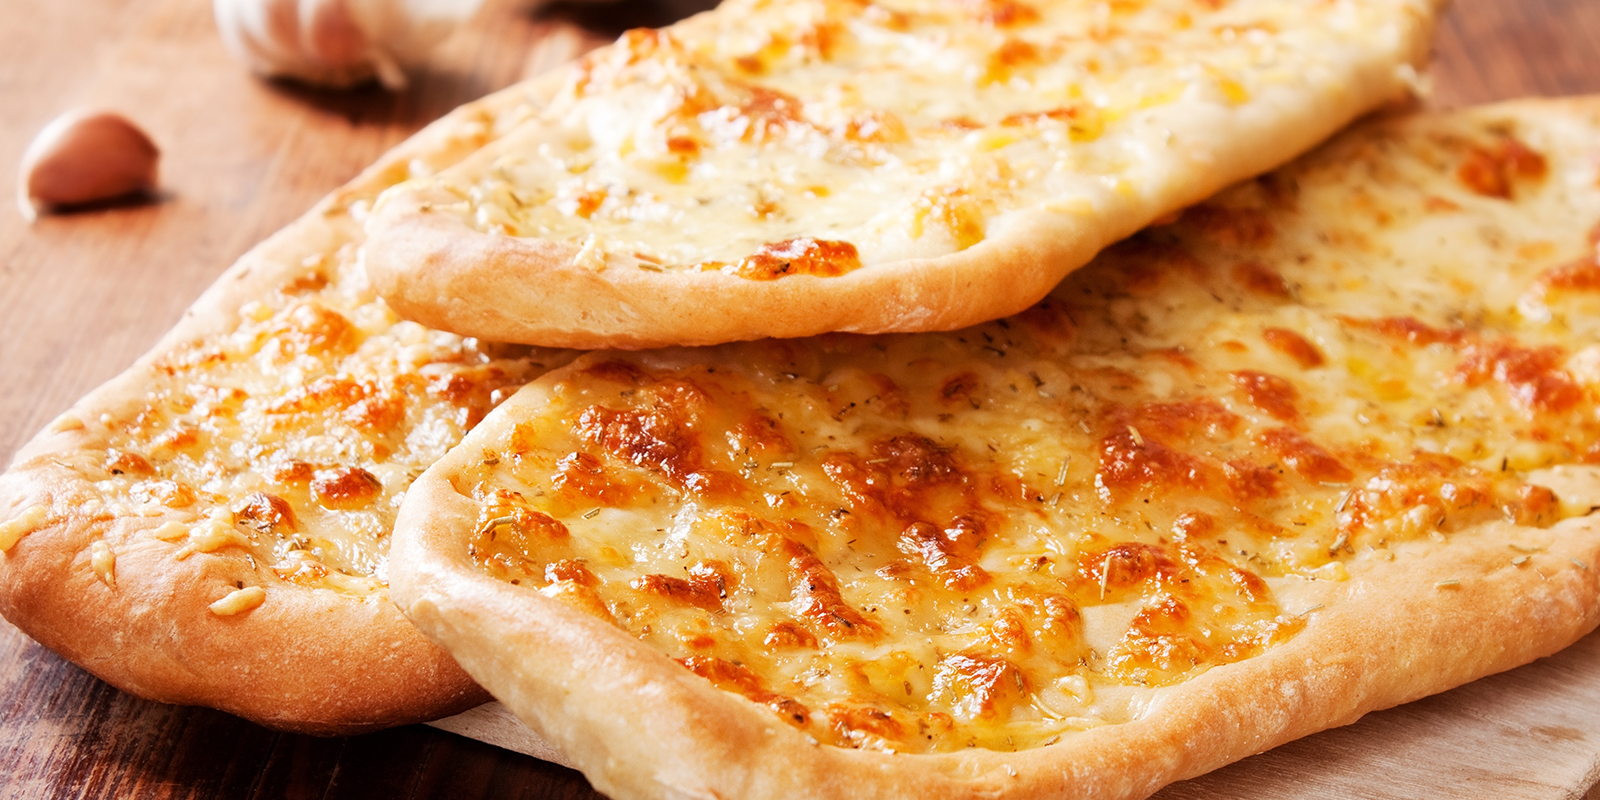 Pizza Mezo Pizza Mezo Hartlepool Takeaway Order Online